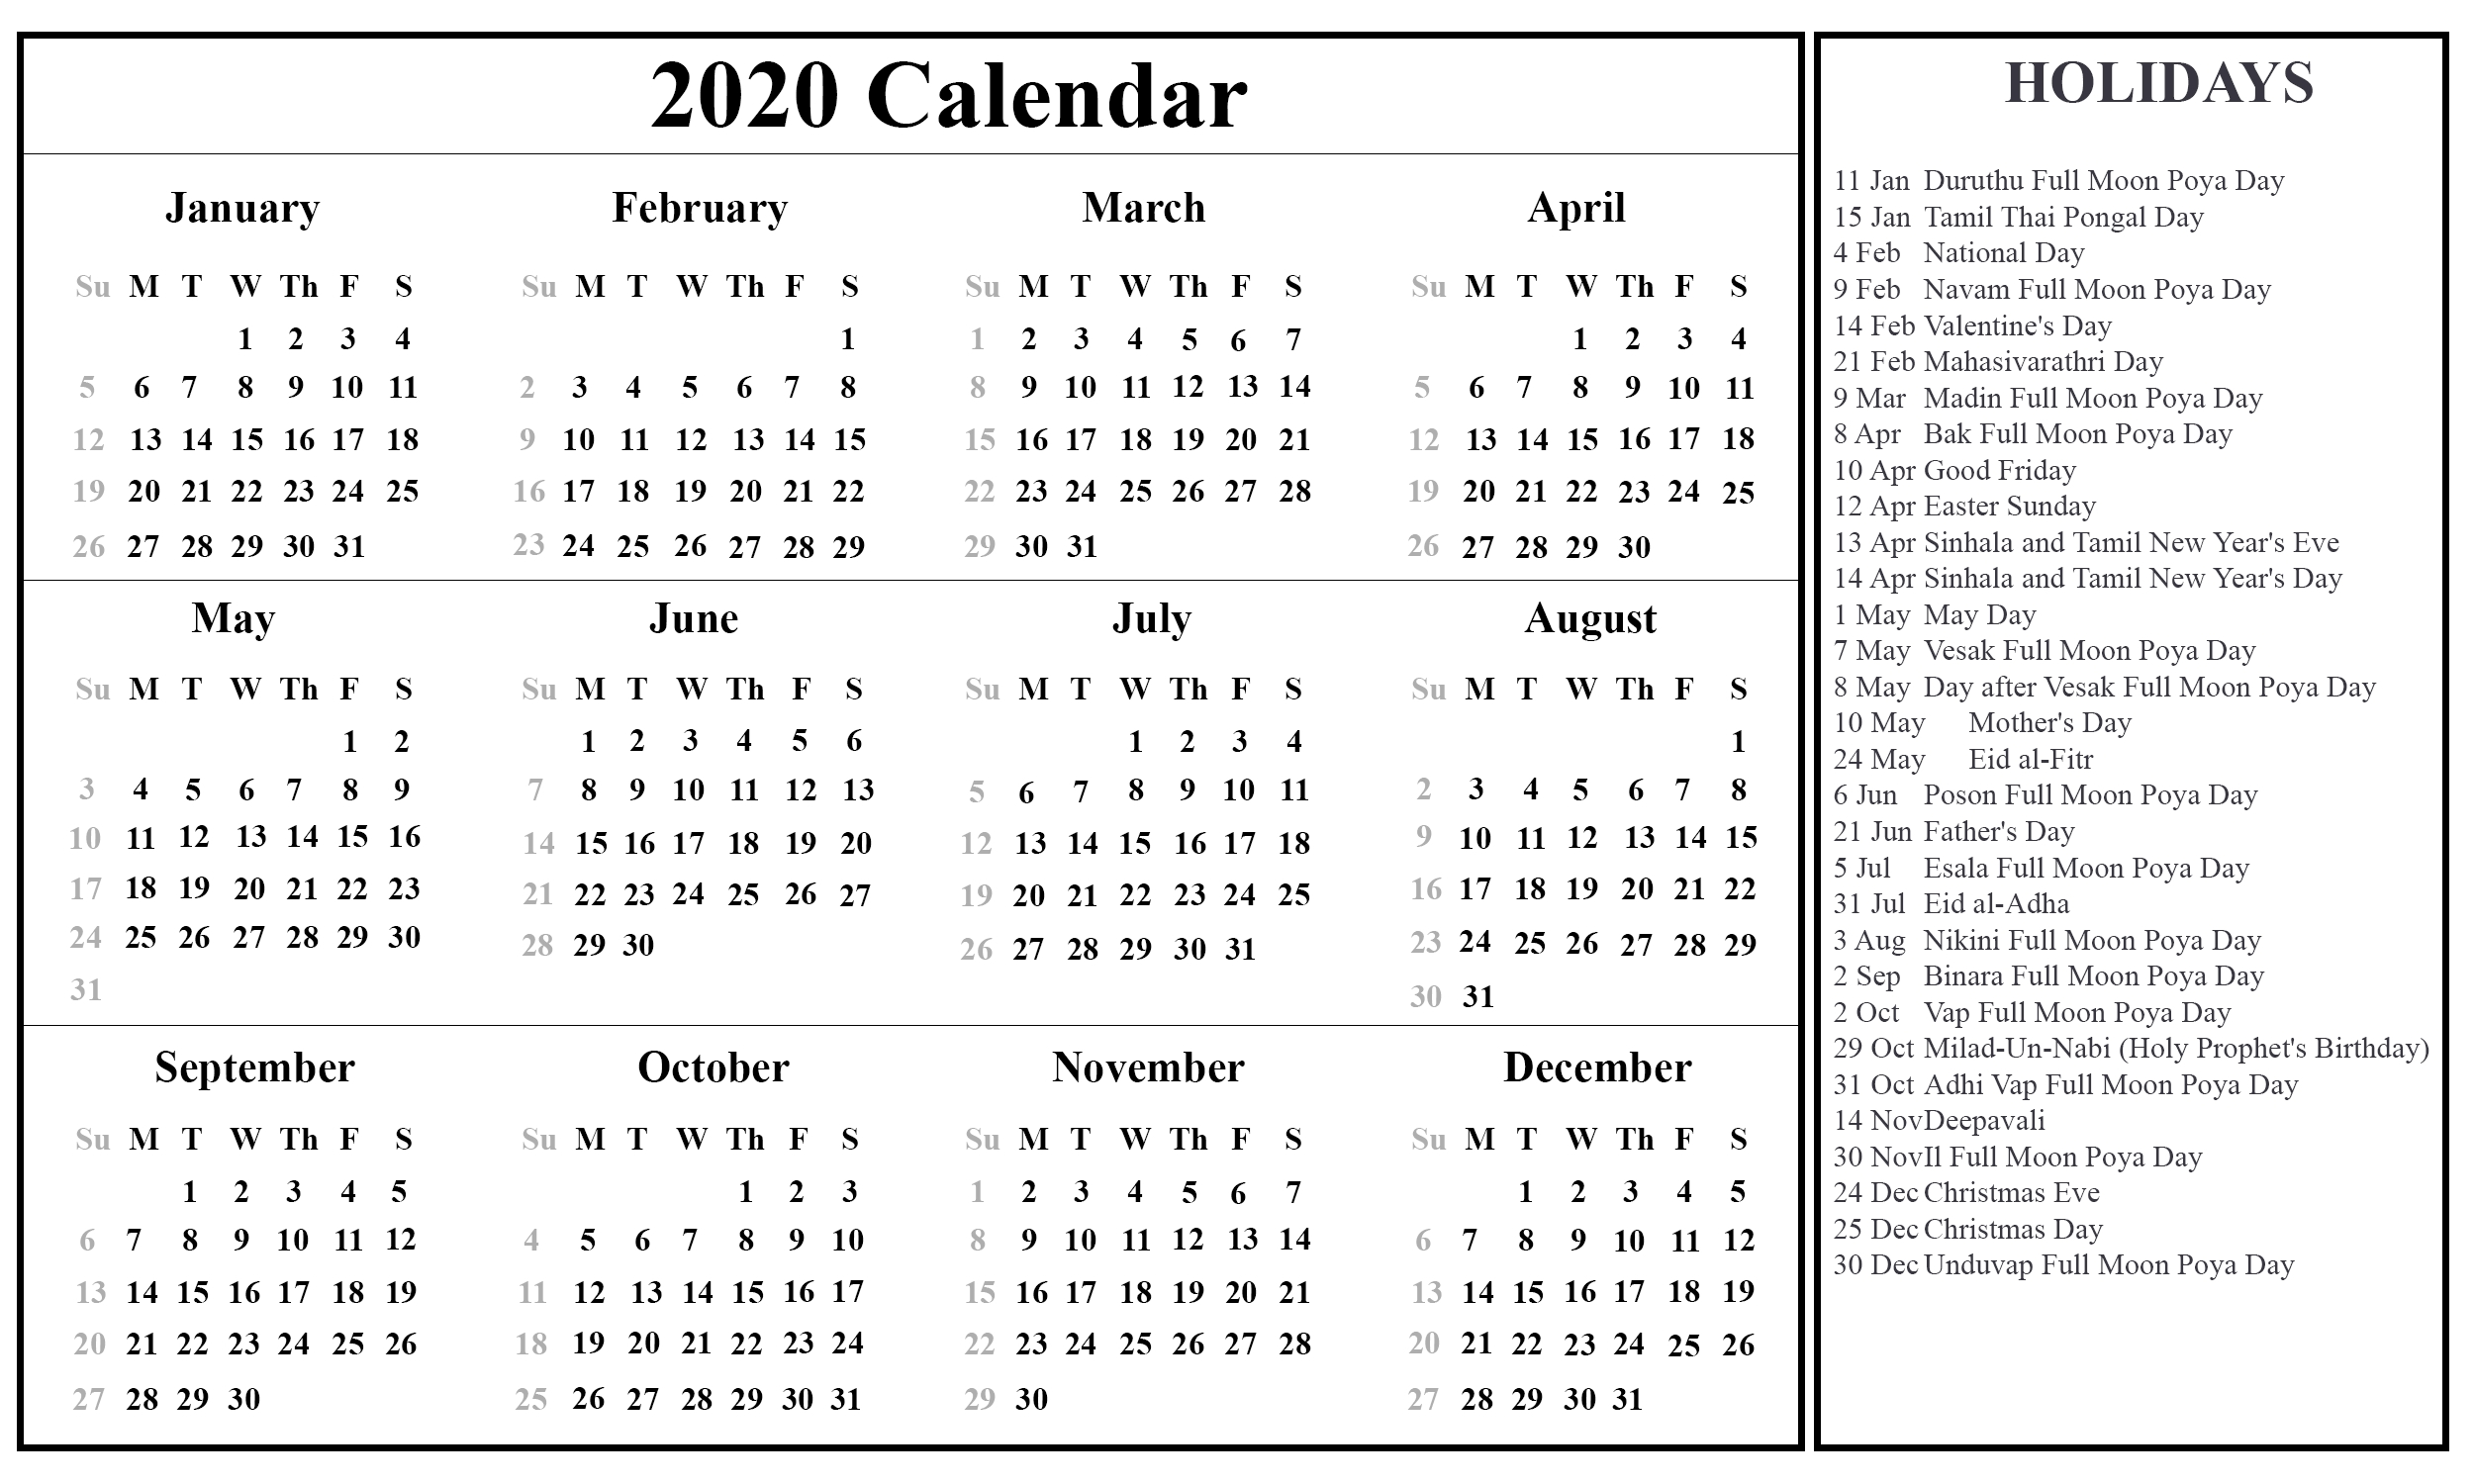 Printable Free Download Sri Lanka Calendar 2020 [Pdf, Excel-Calendar With Public Holidays 2020